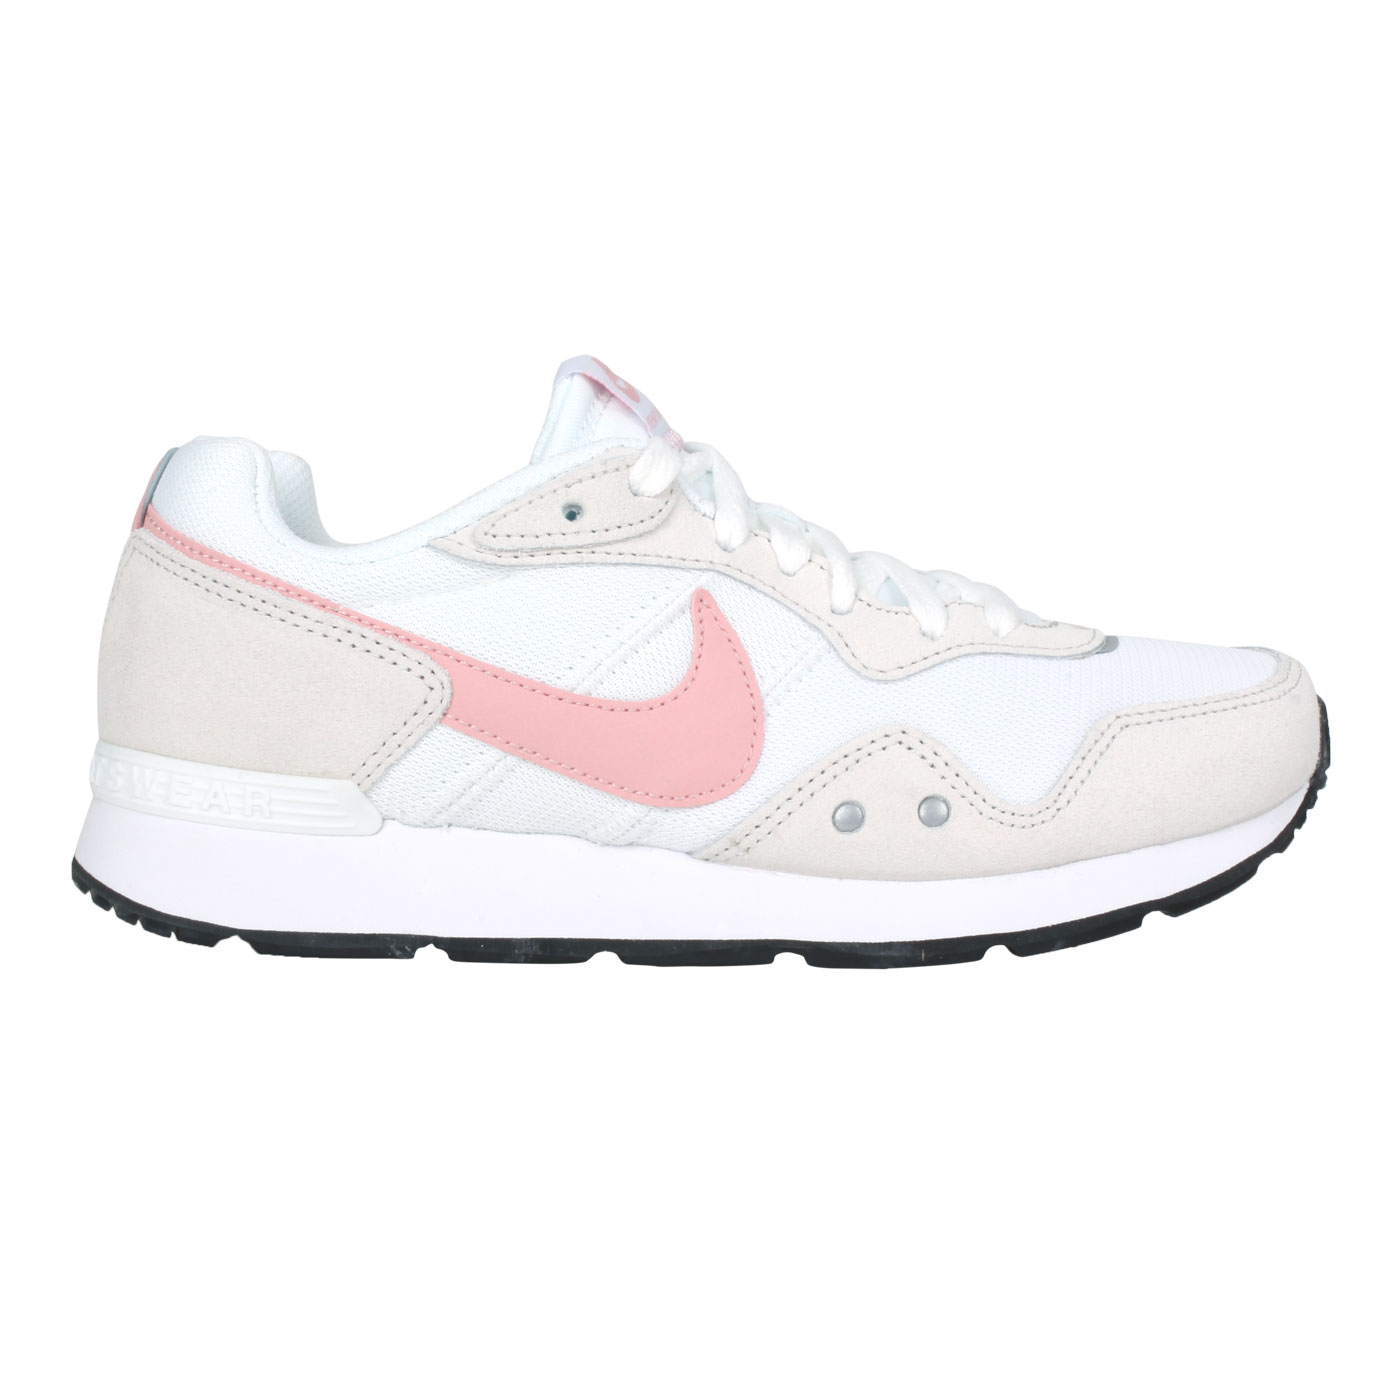 NIKE 女款休閒鞋  @WMNS VENTURE RENNER WIDE@DM8454100